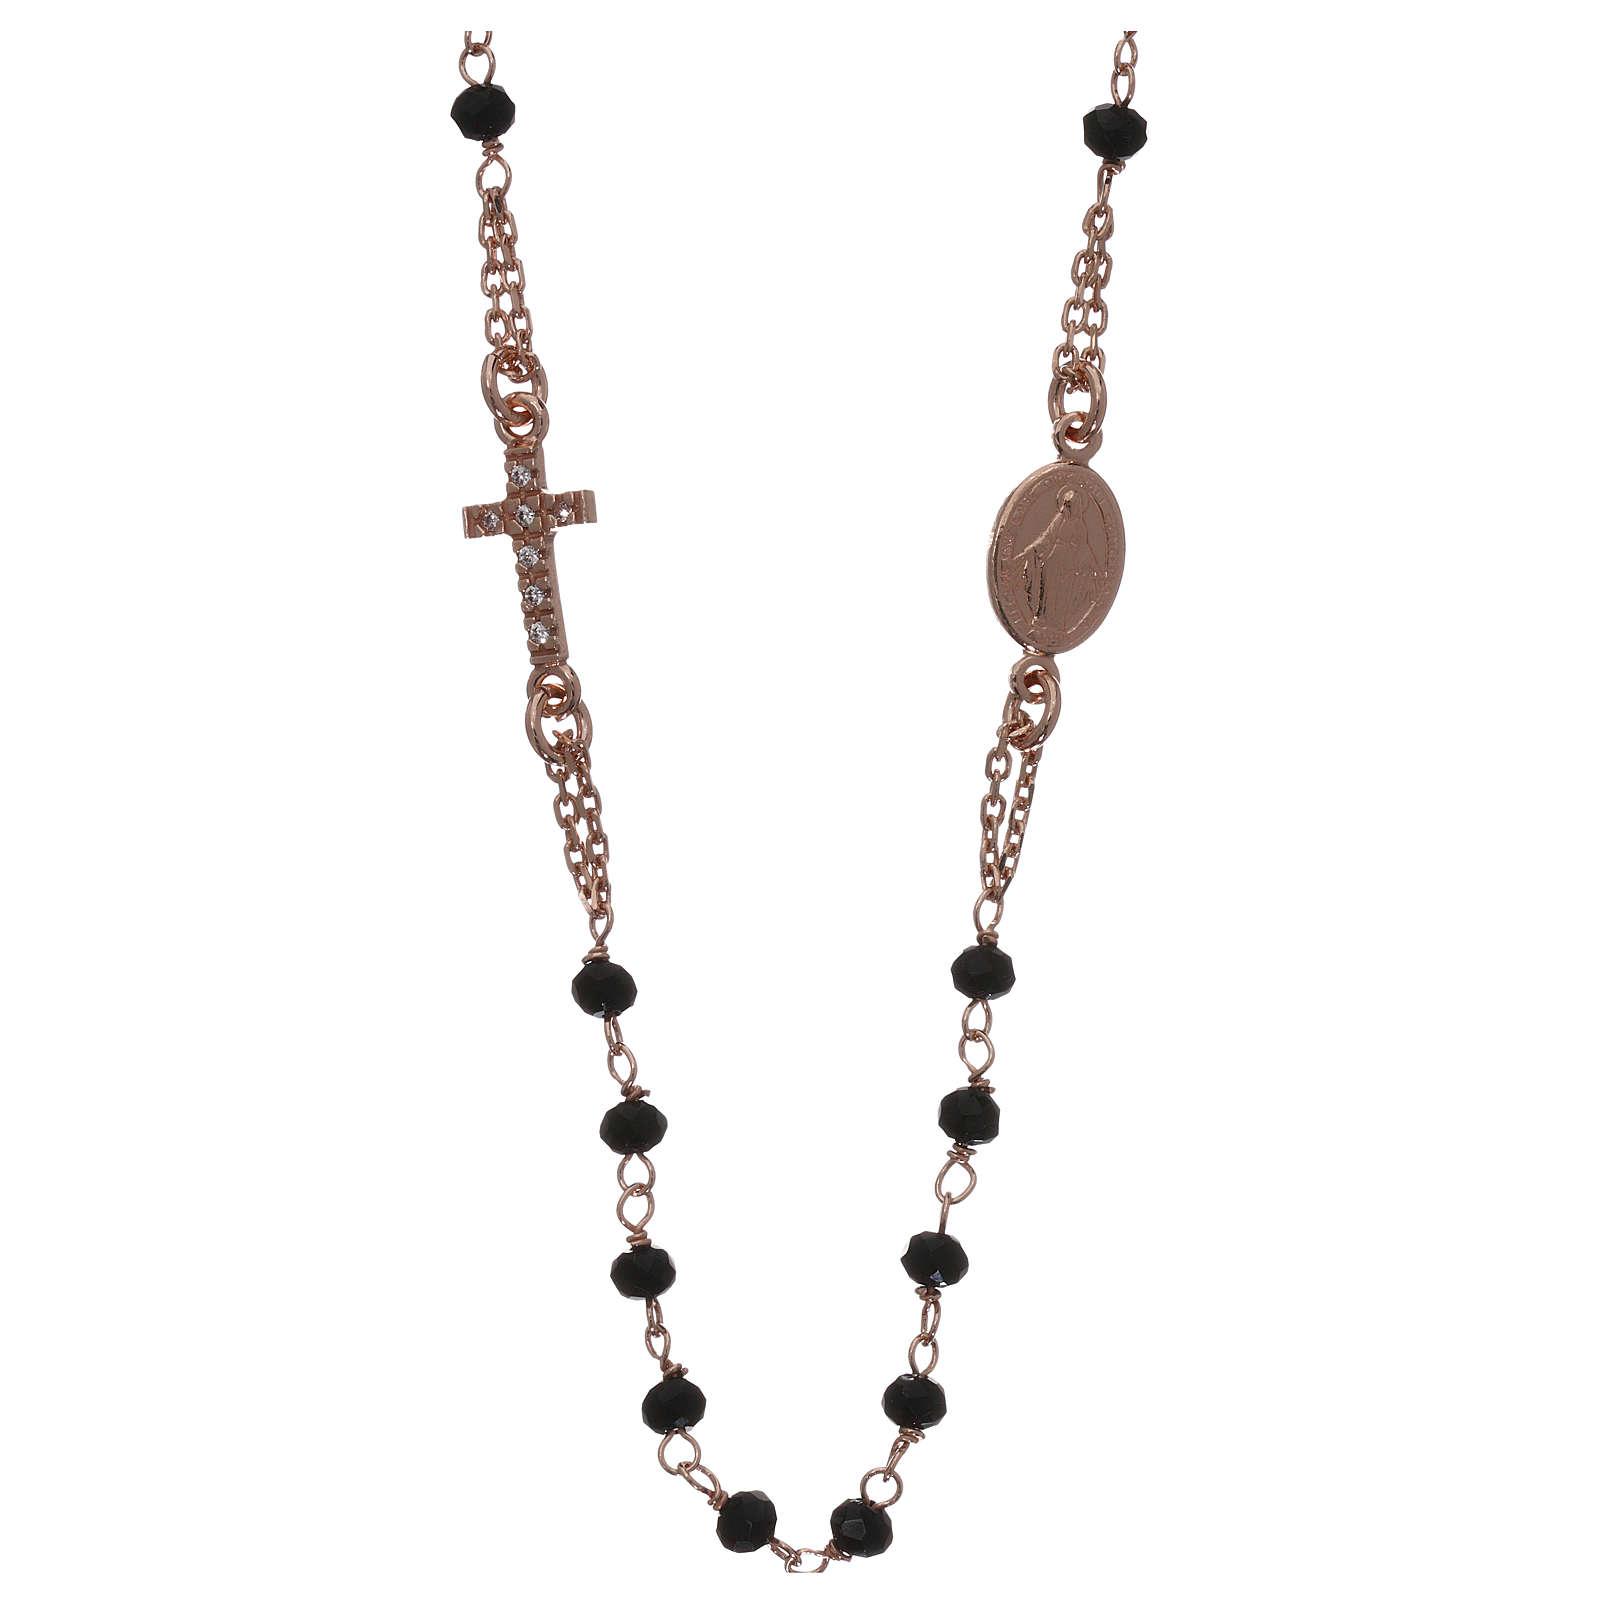 Naszyjnik różaniec na szyję AMEN kryształki czarne srebro 925 Rose 4